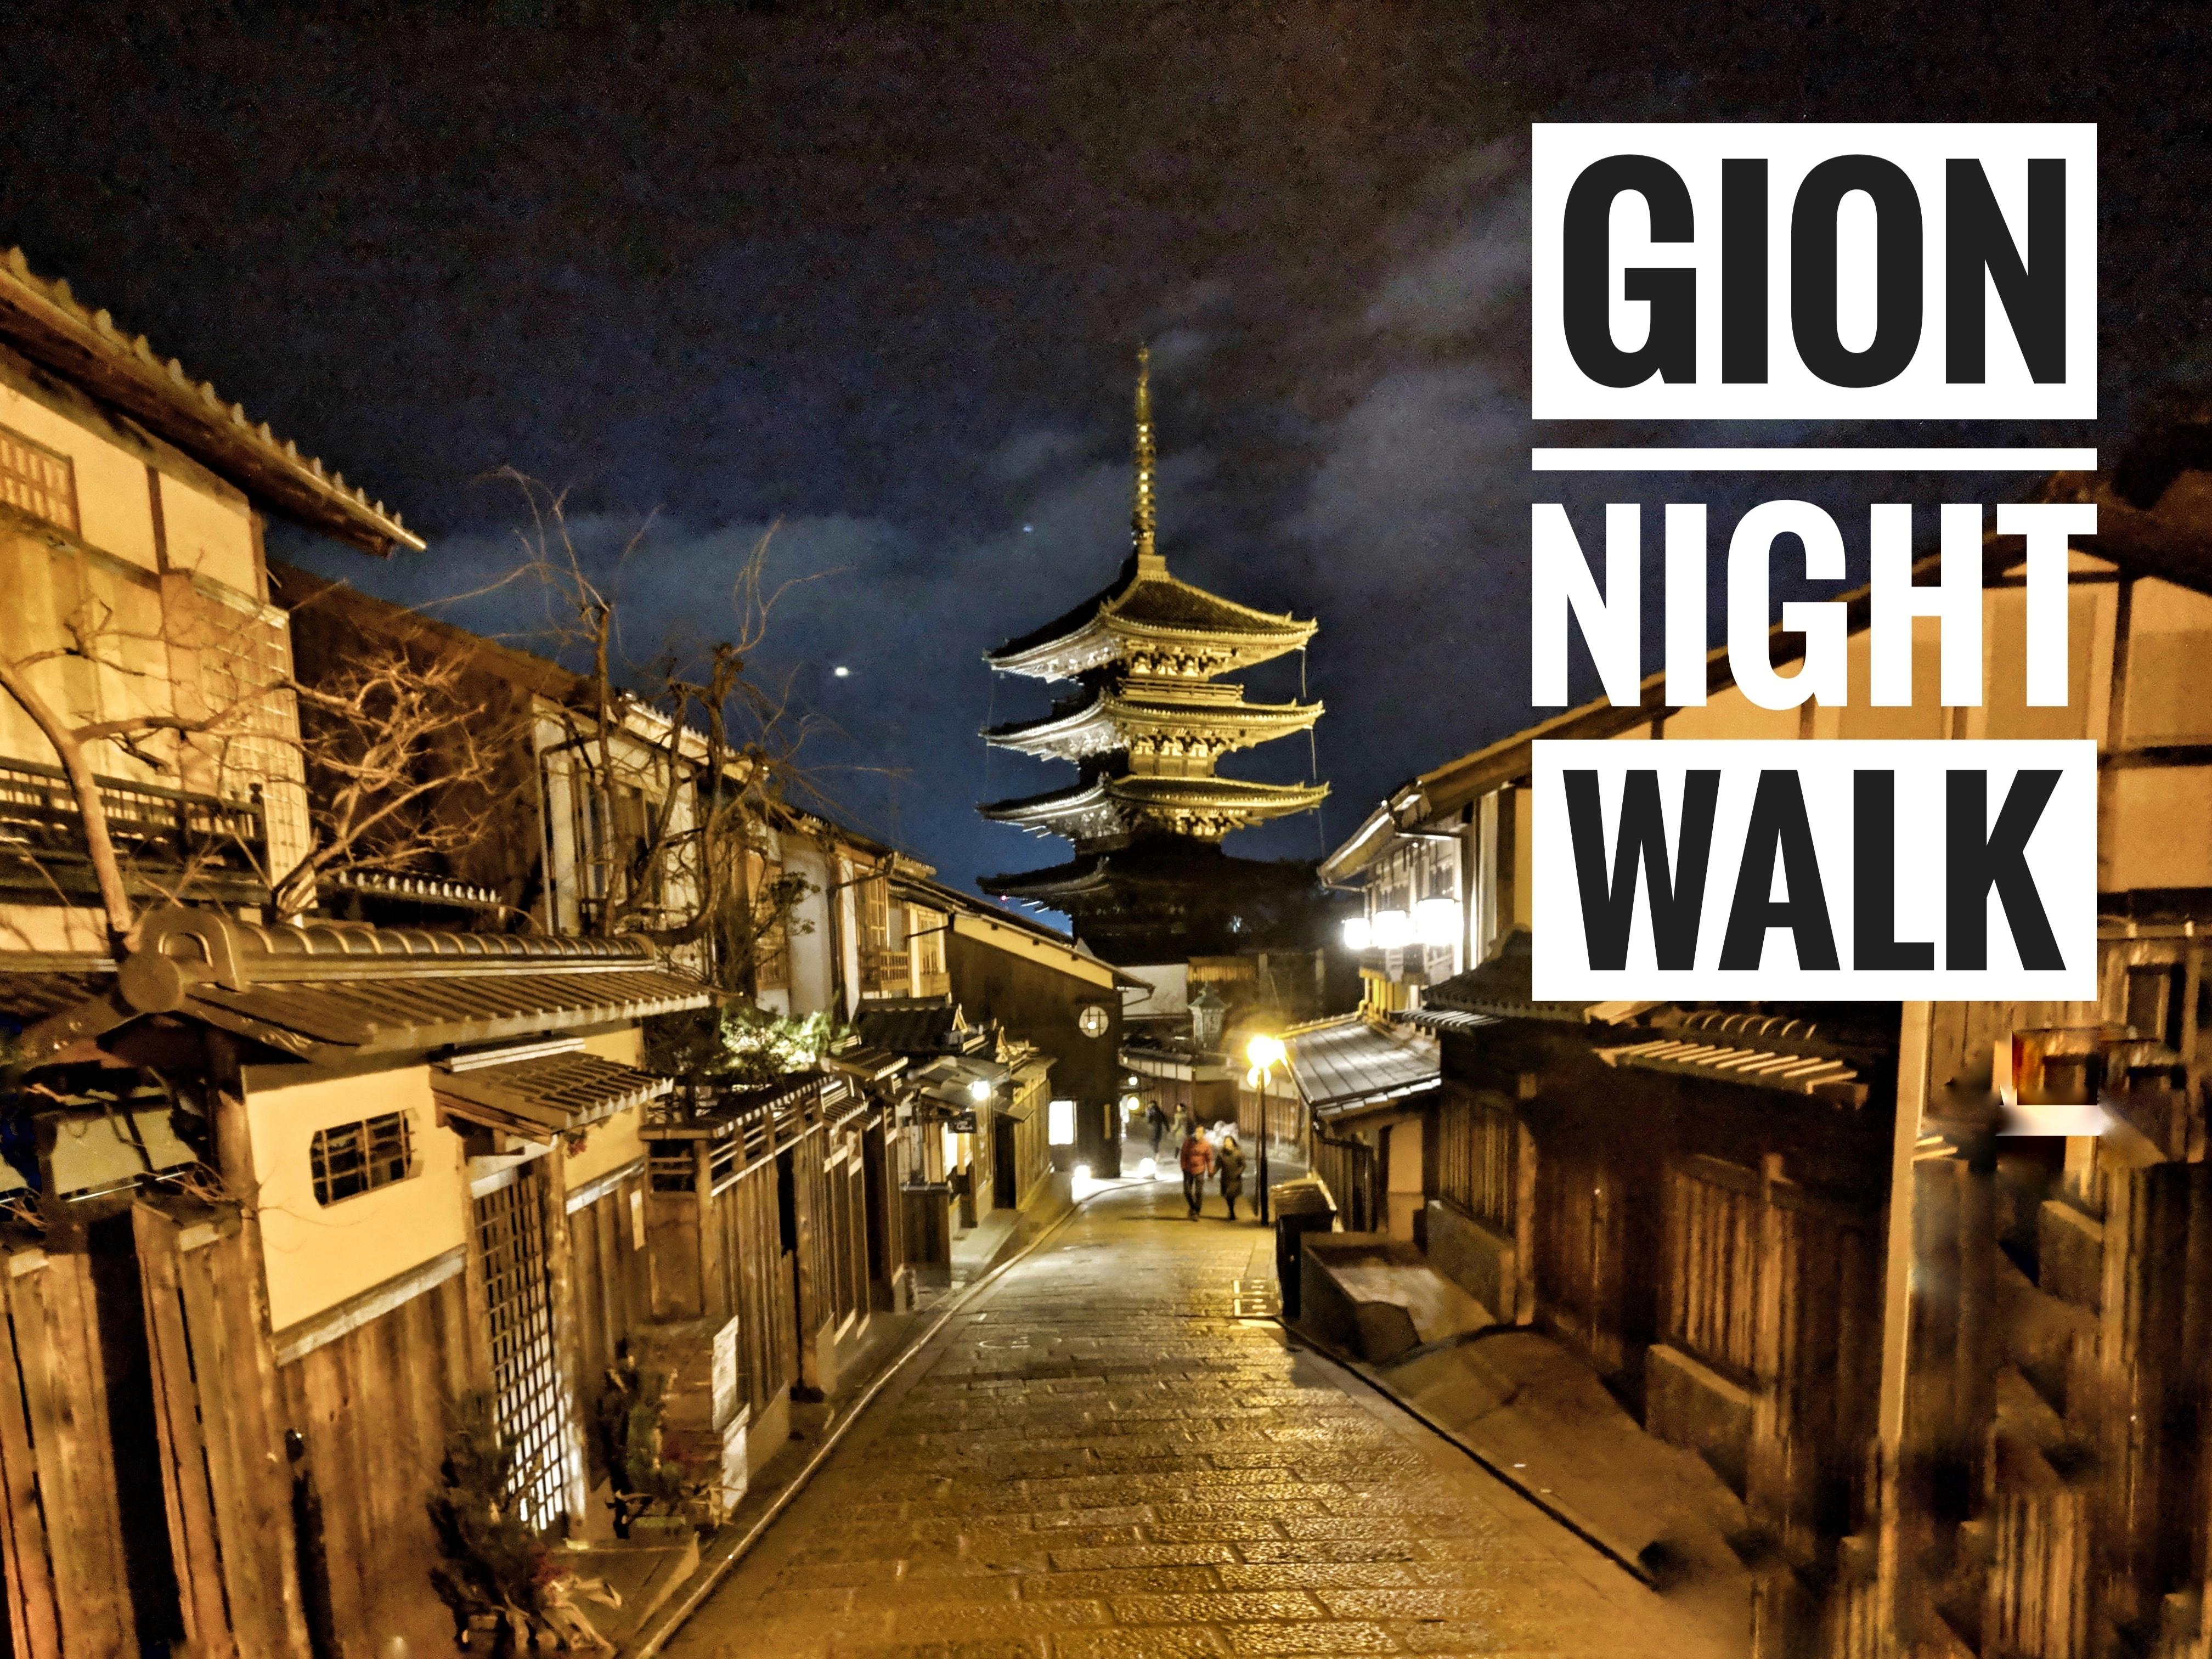 Go On A Gion Night Walk Kyoto Voyagin